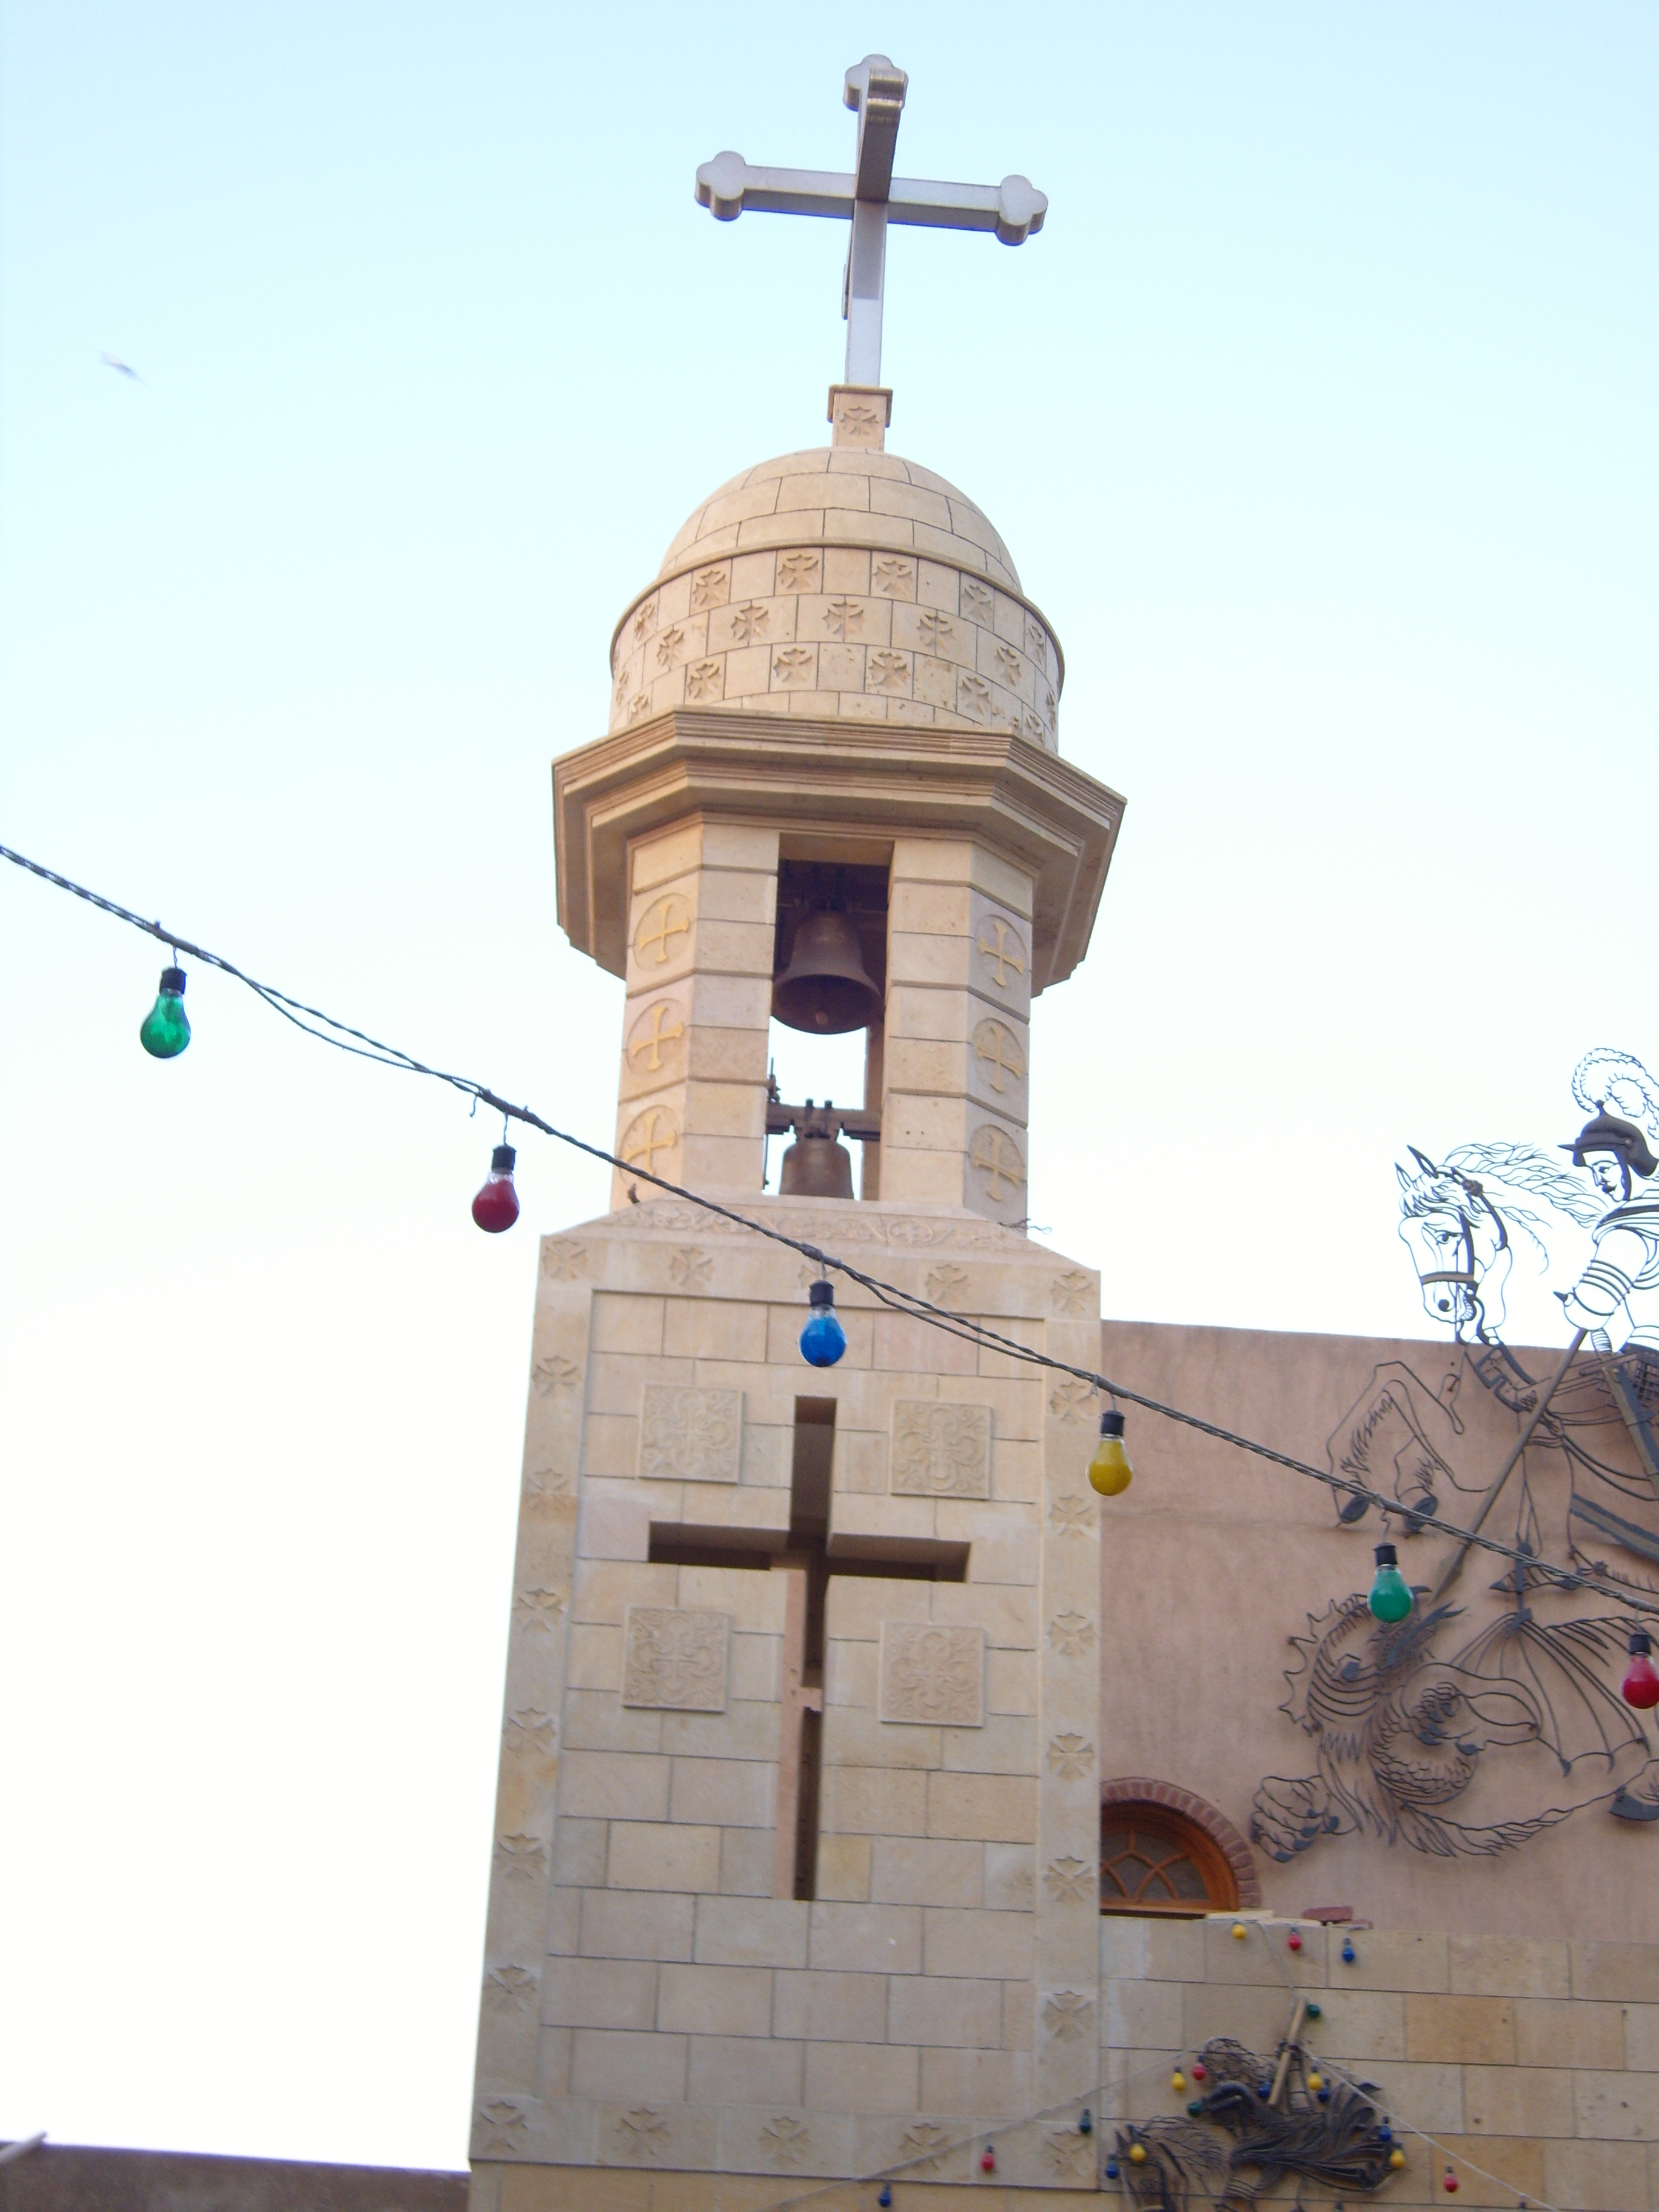 Coptic Orthodox Church in Egypt Coptic Orthodox Church